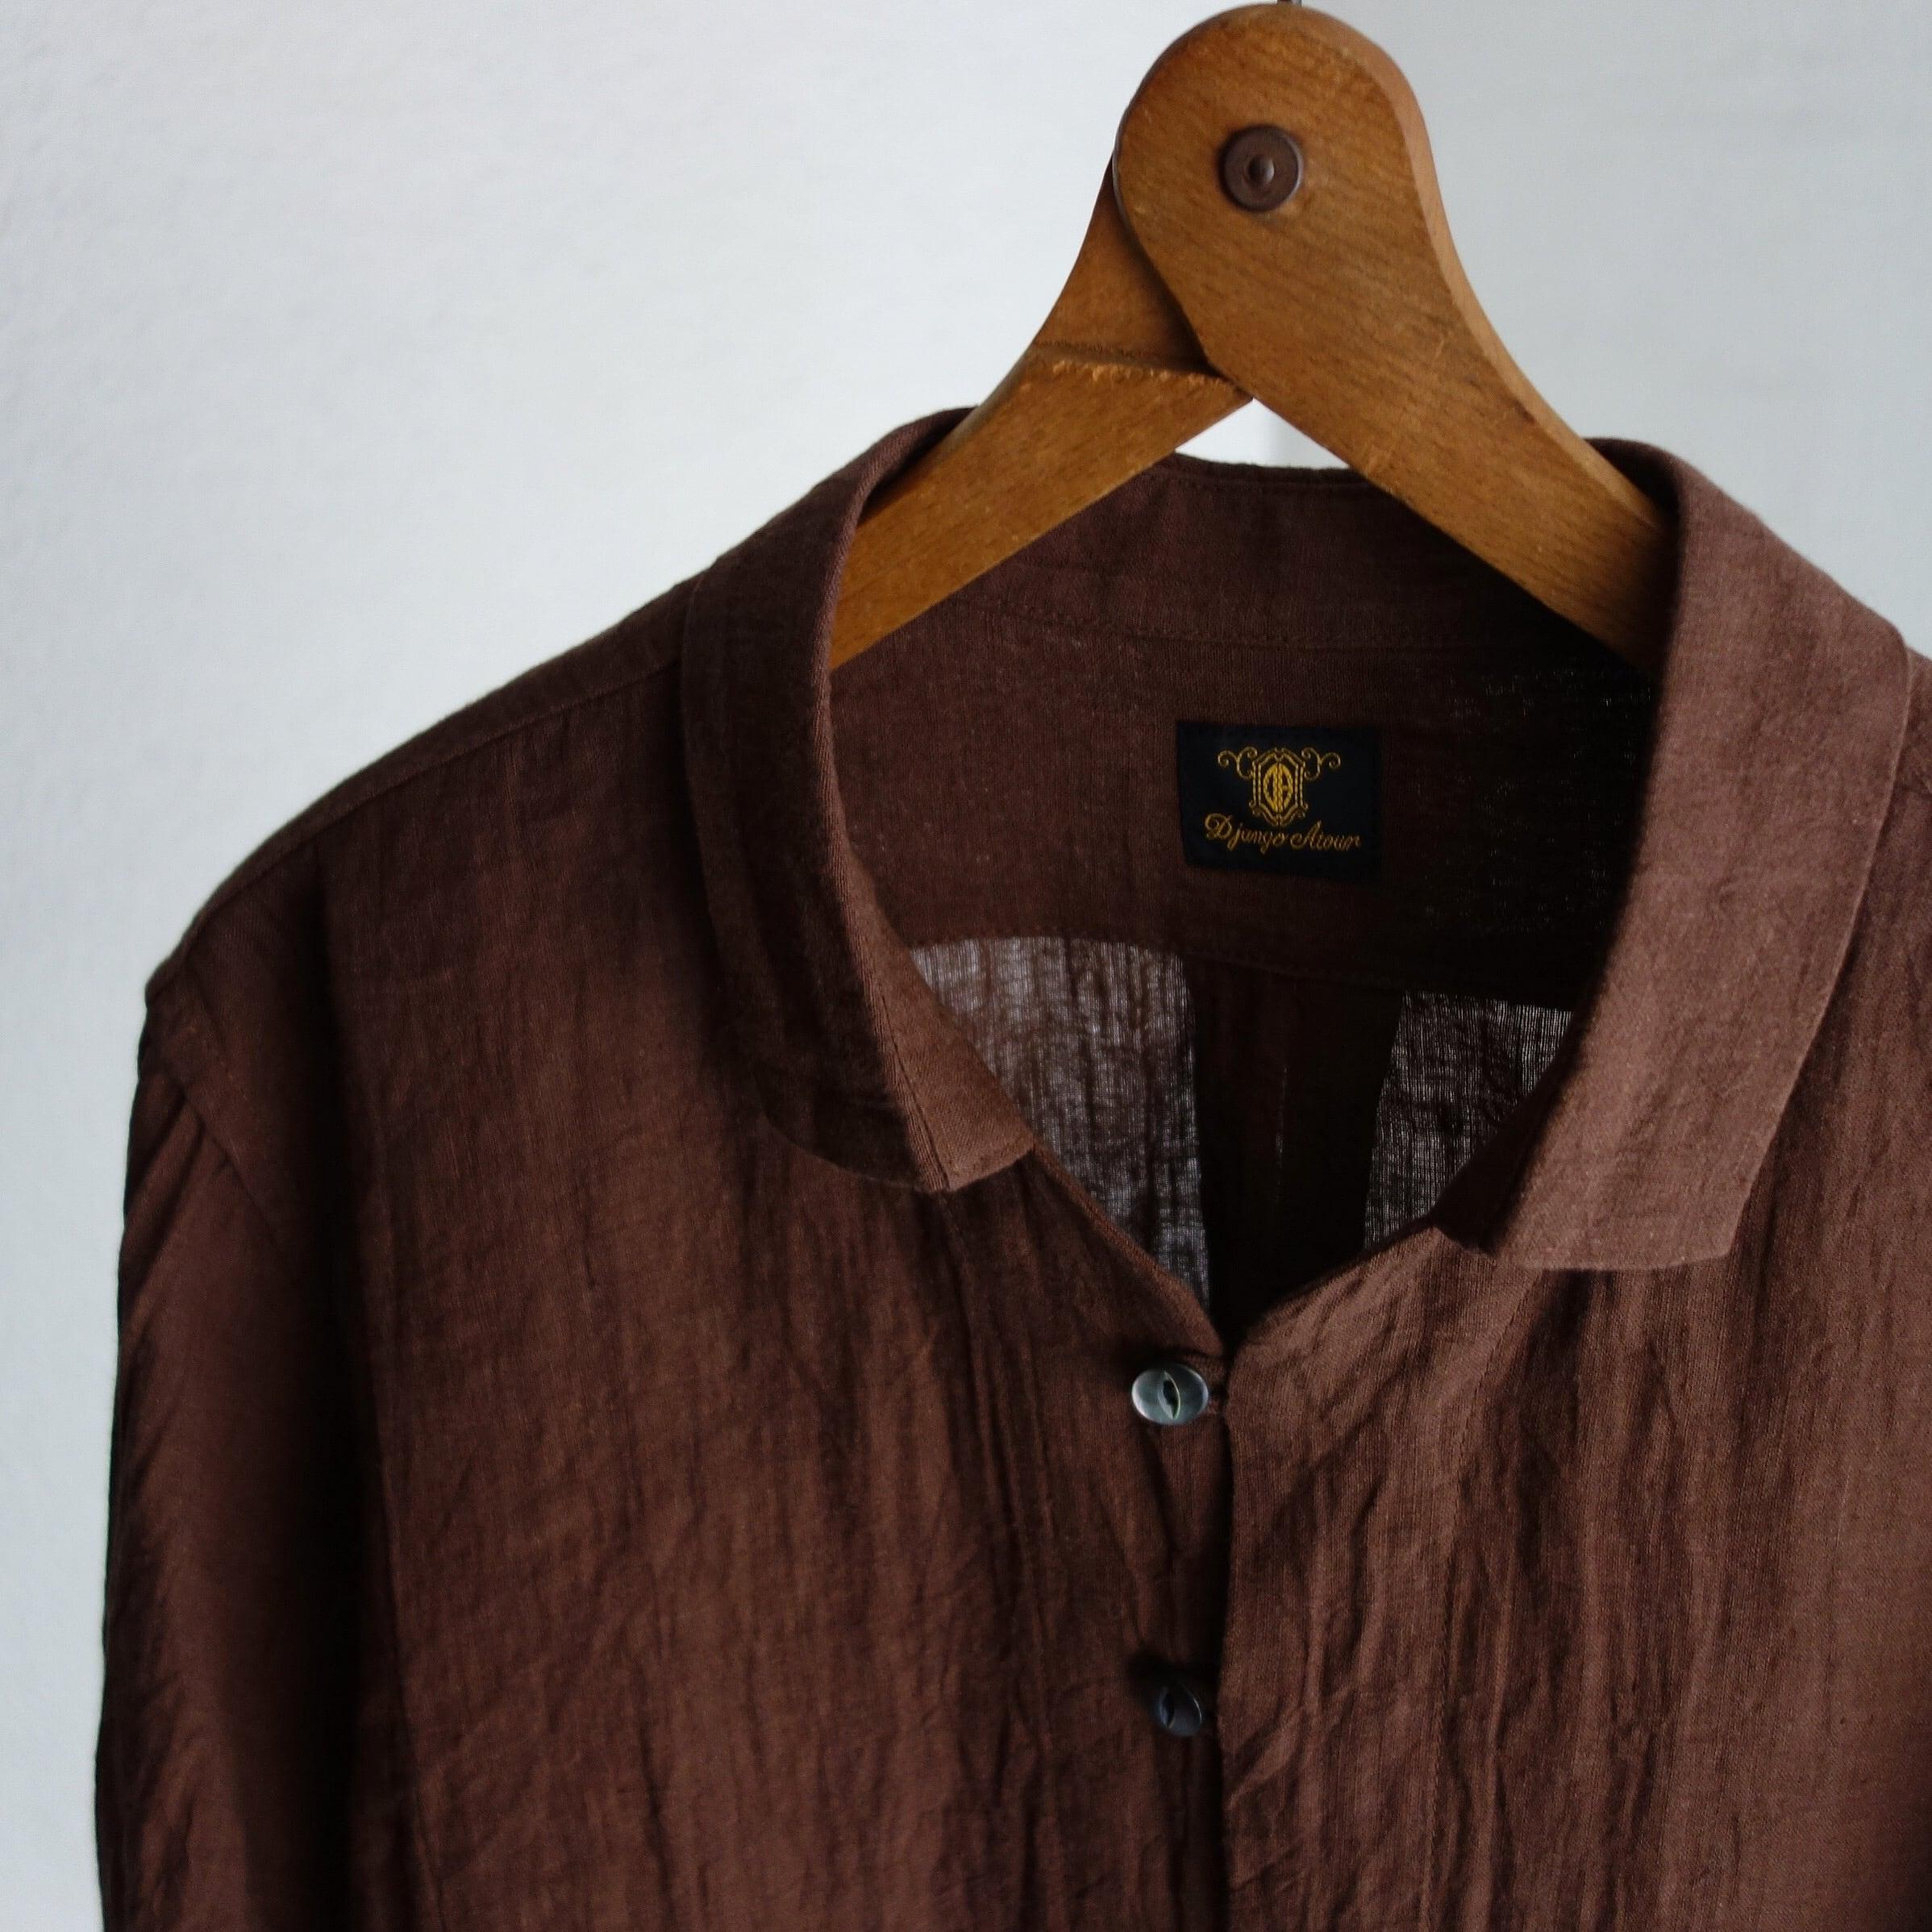 da farmers linen shirtcardigan / brown